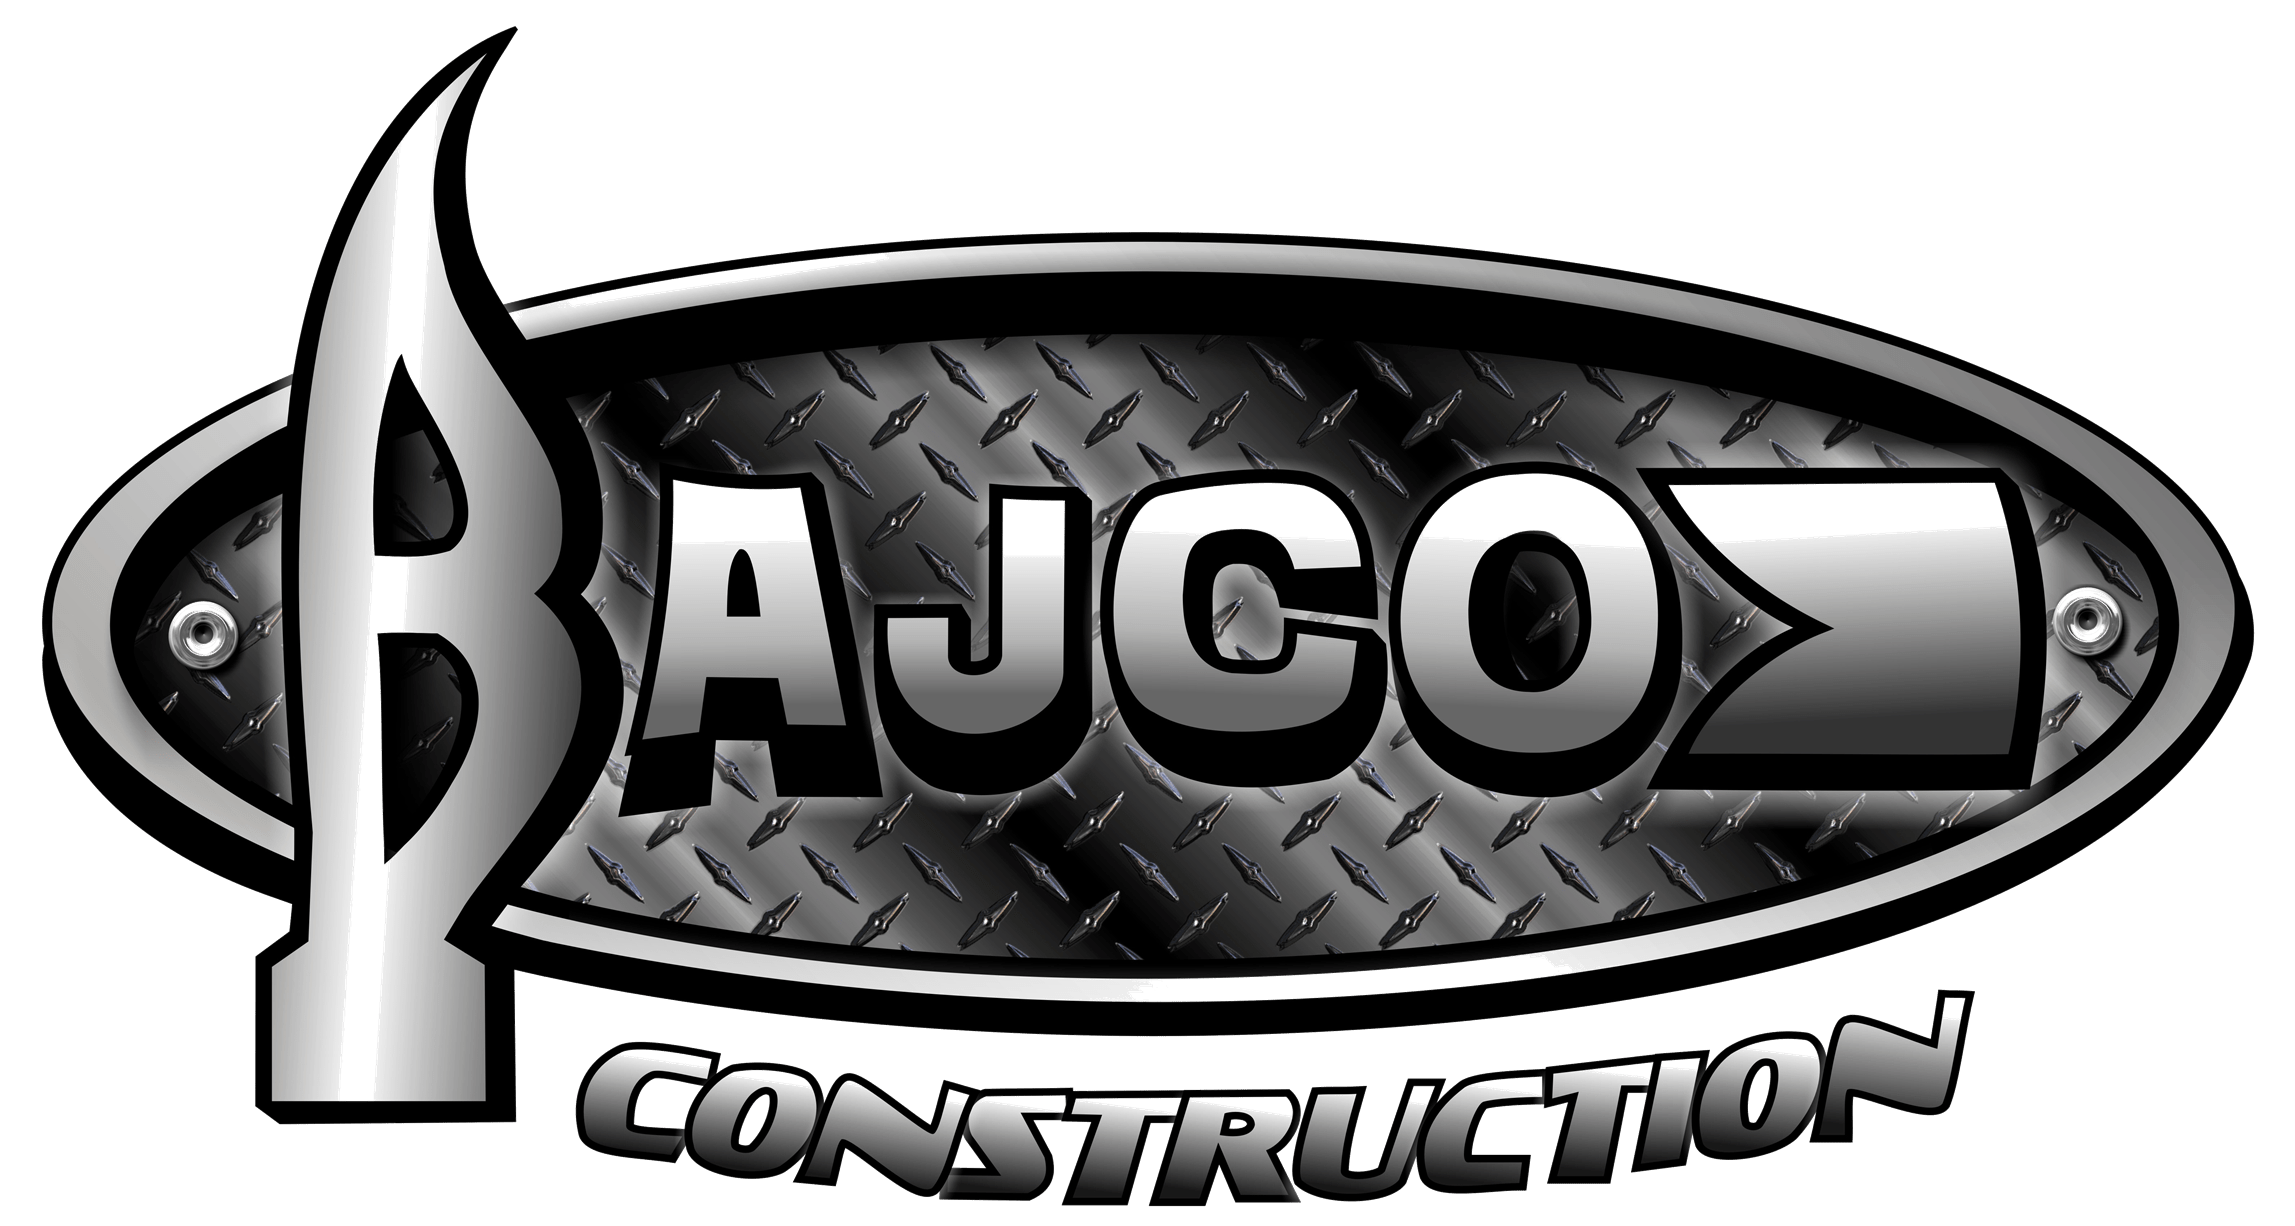 BAJCO Logo(Website)